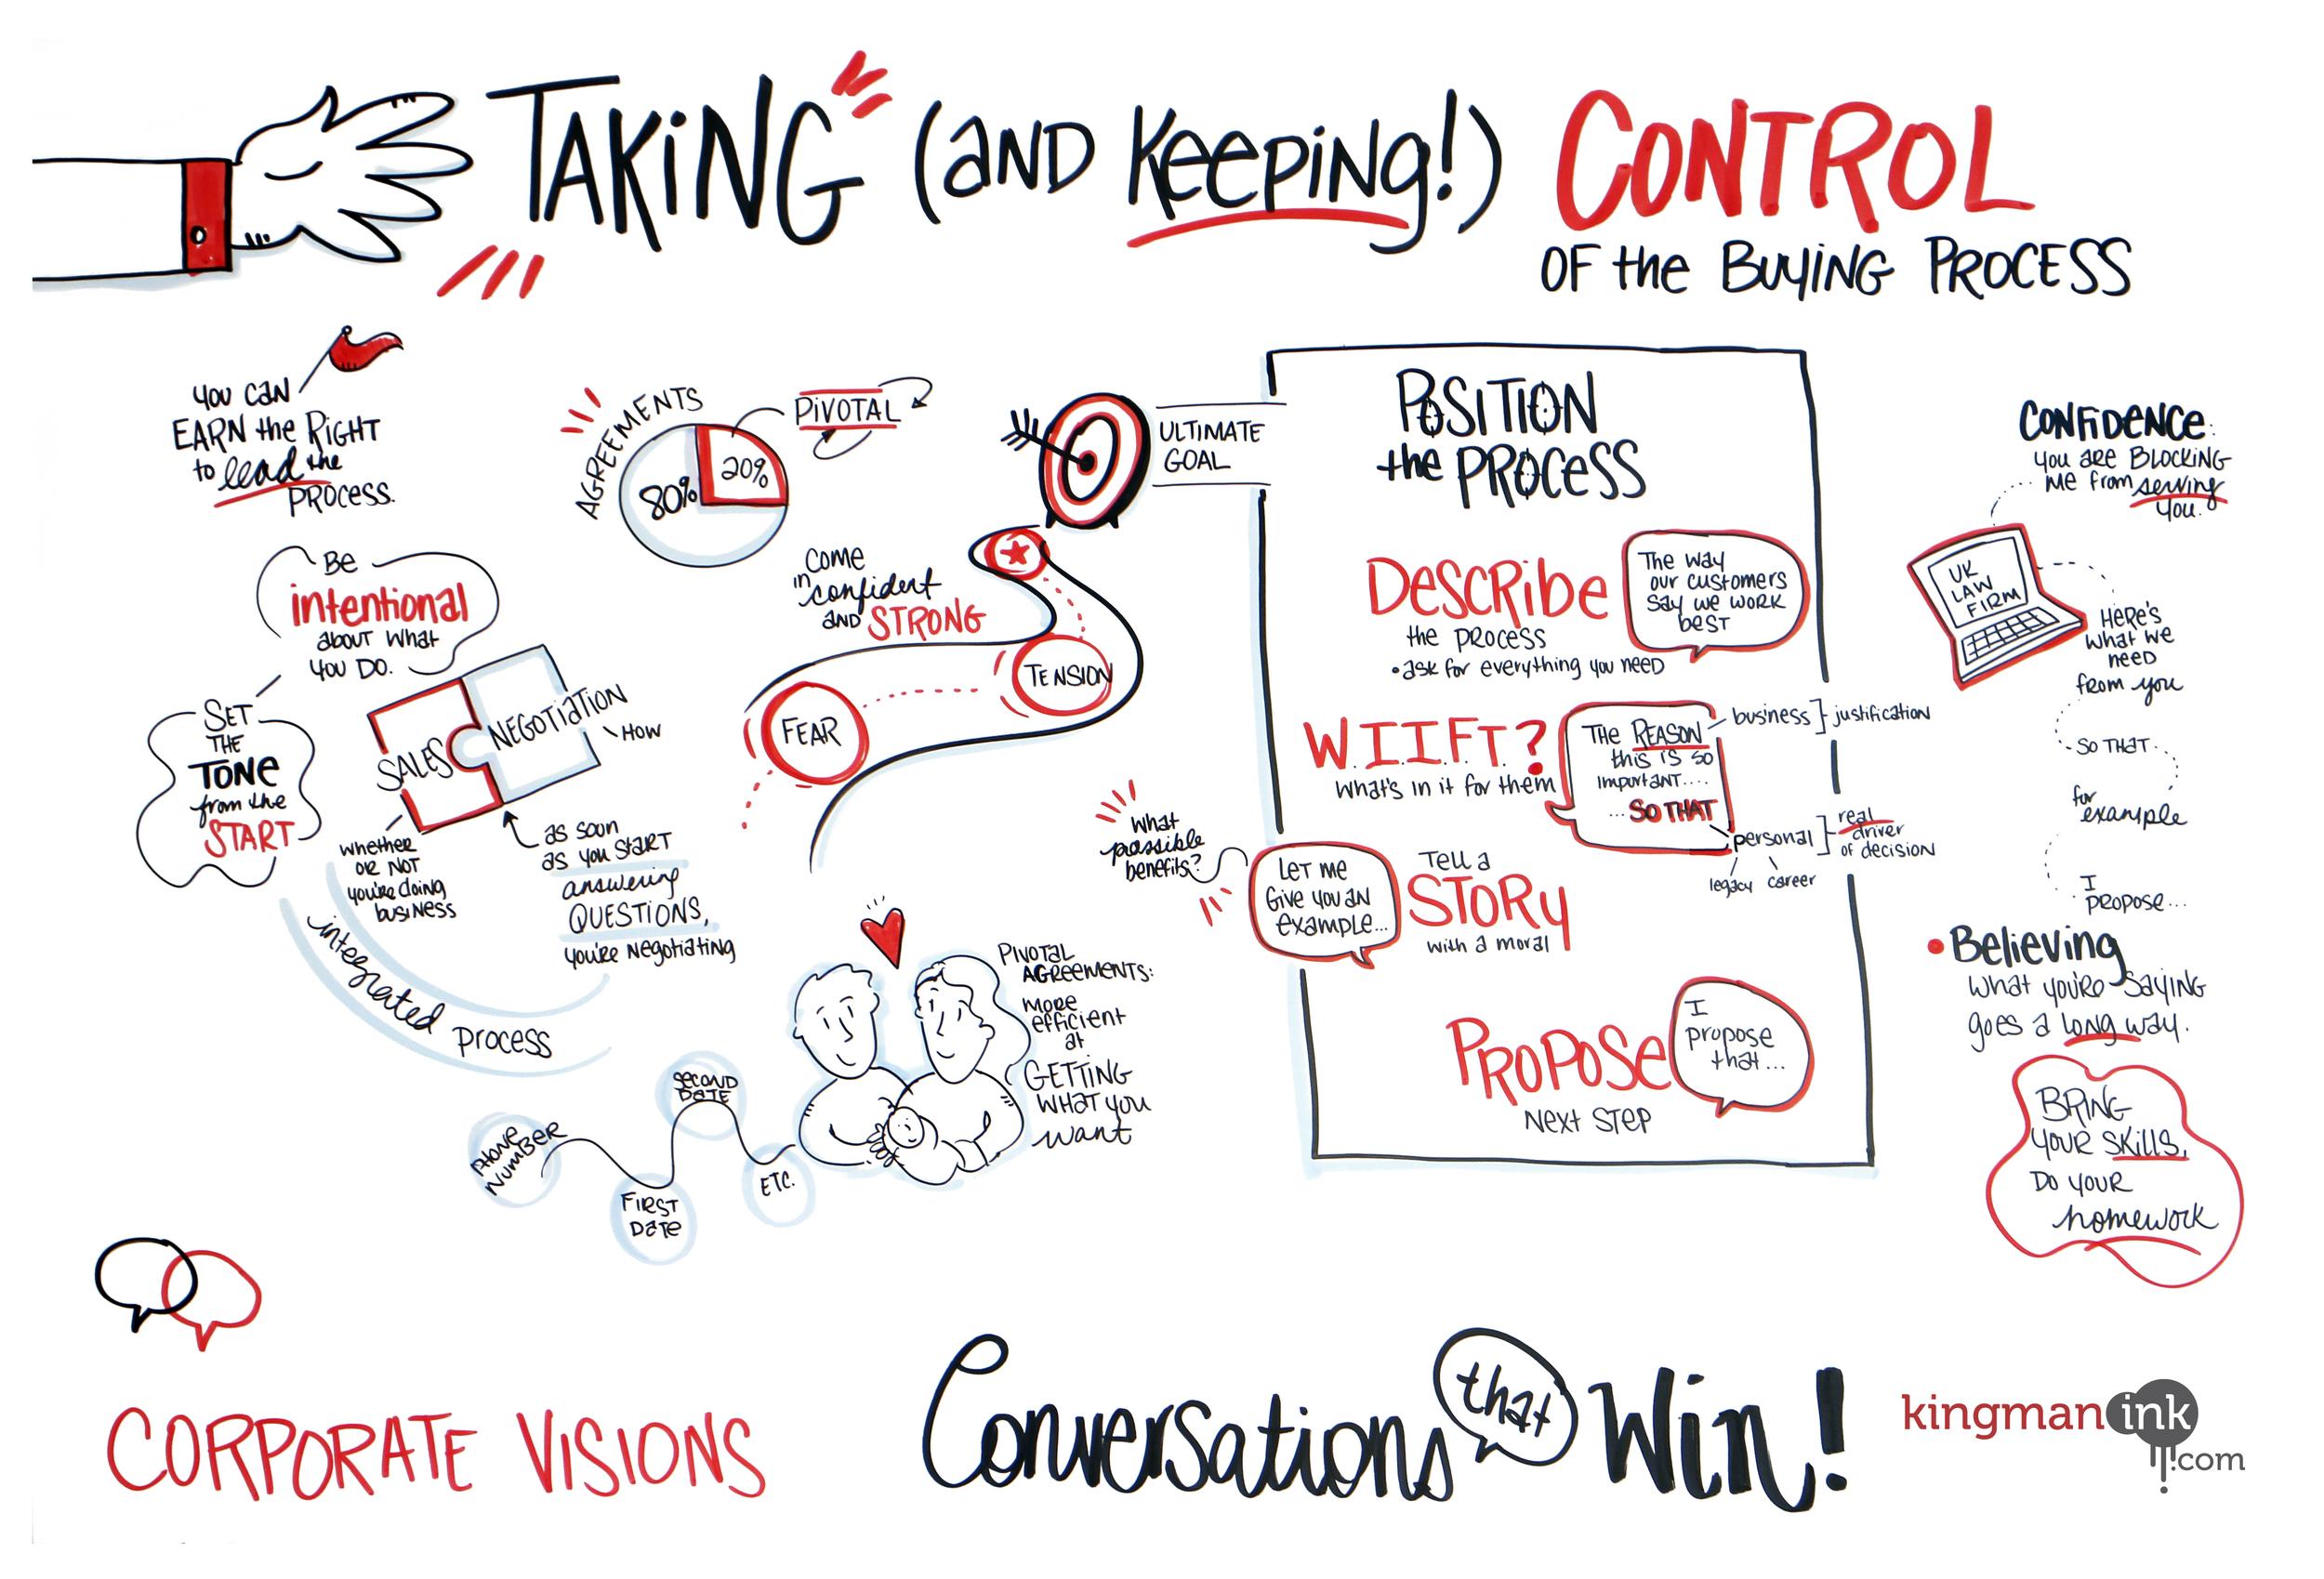 KingmanInk_CorporateVisions_TakingControl.jpg